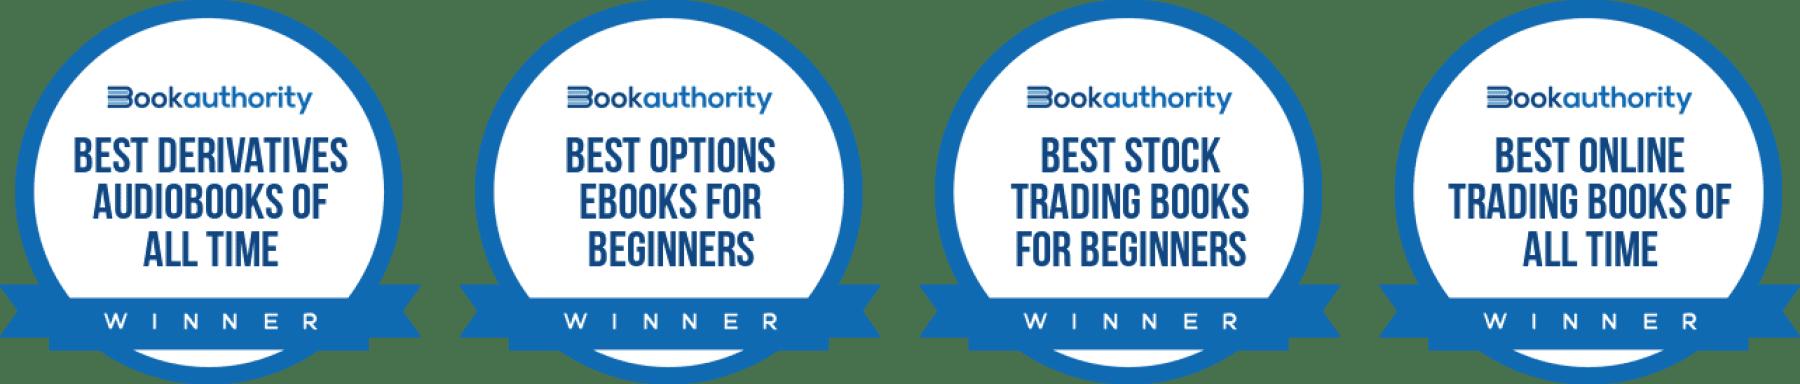 BookAuthorityBadges_DayTrading